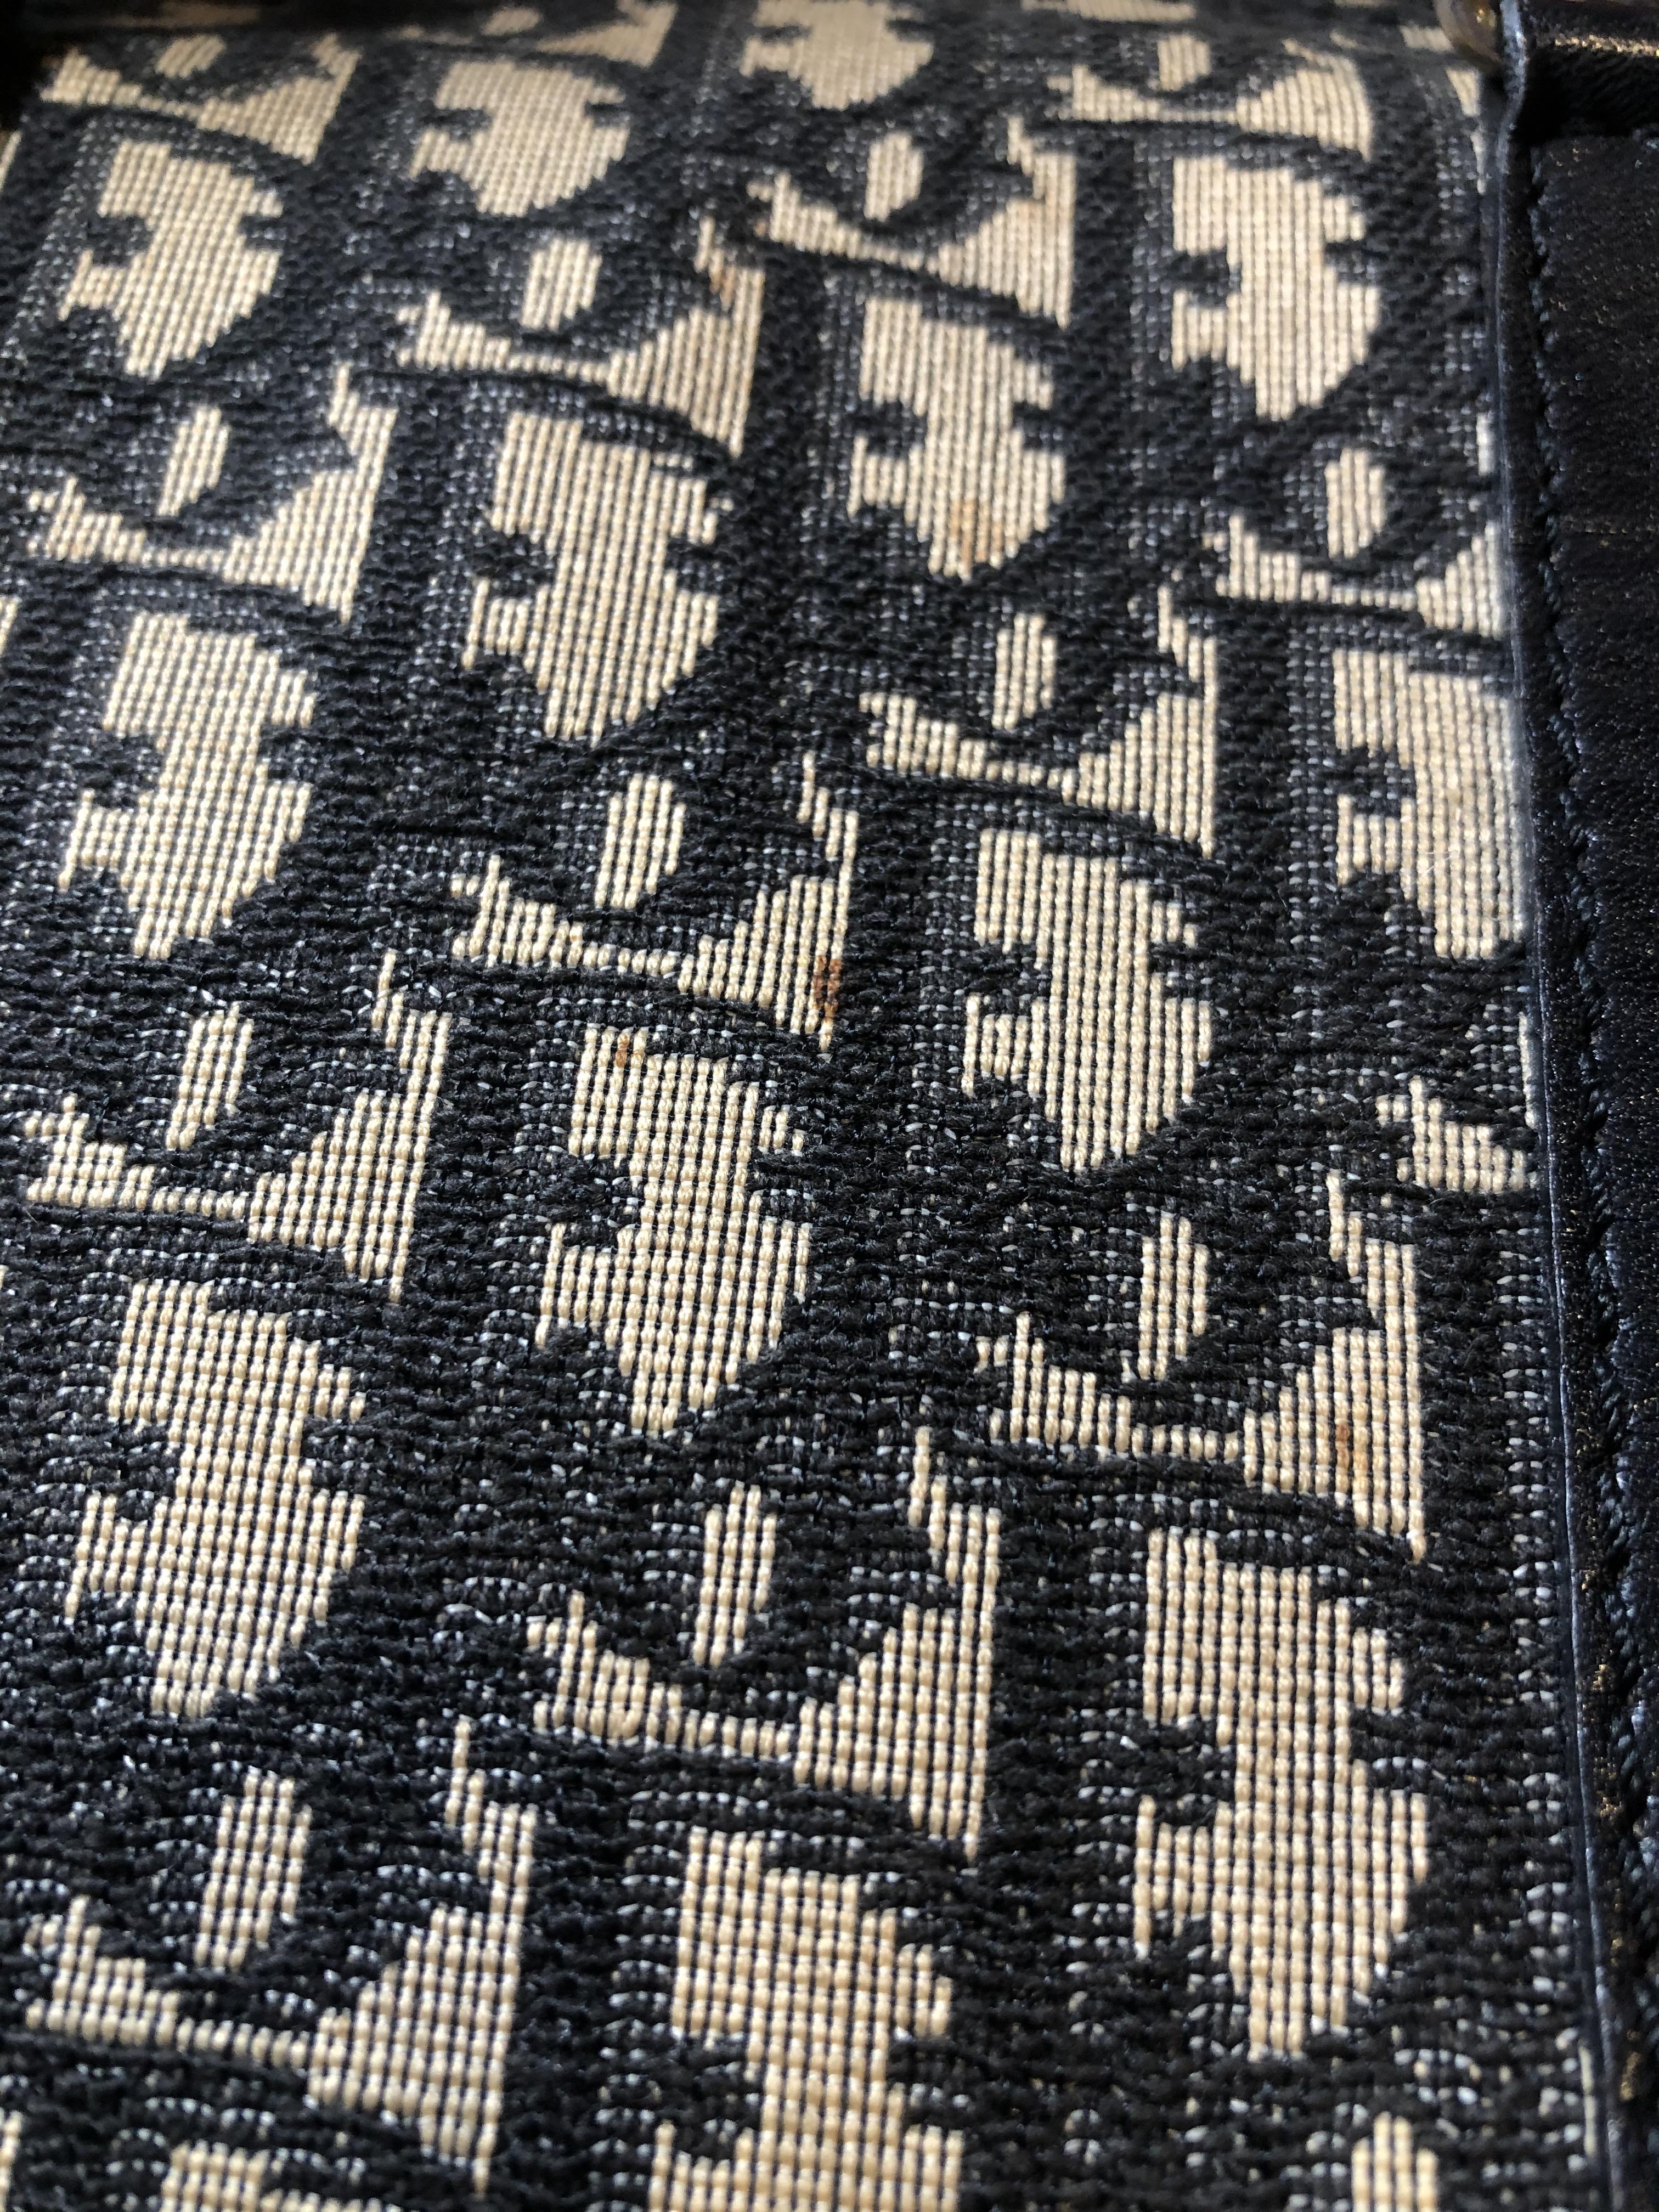 A Dior Vintage Small Boston Handbag, - Image 3 of 5